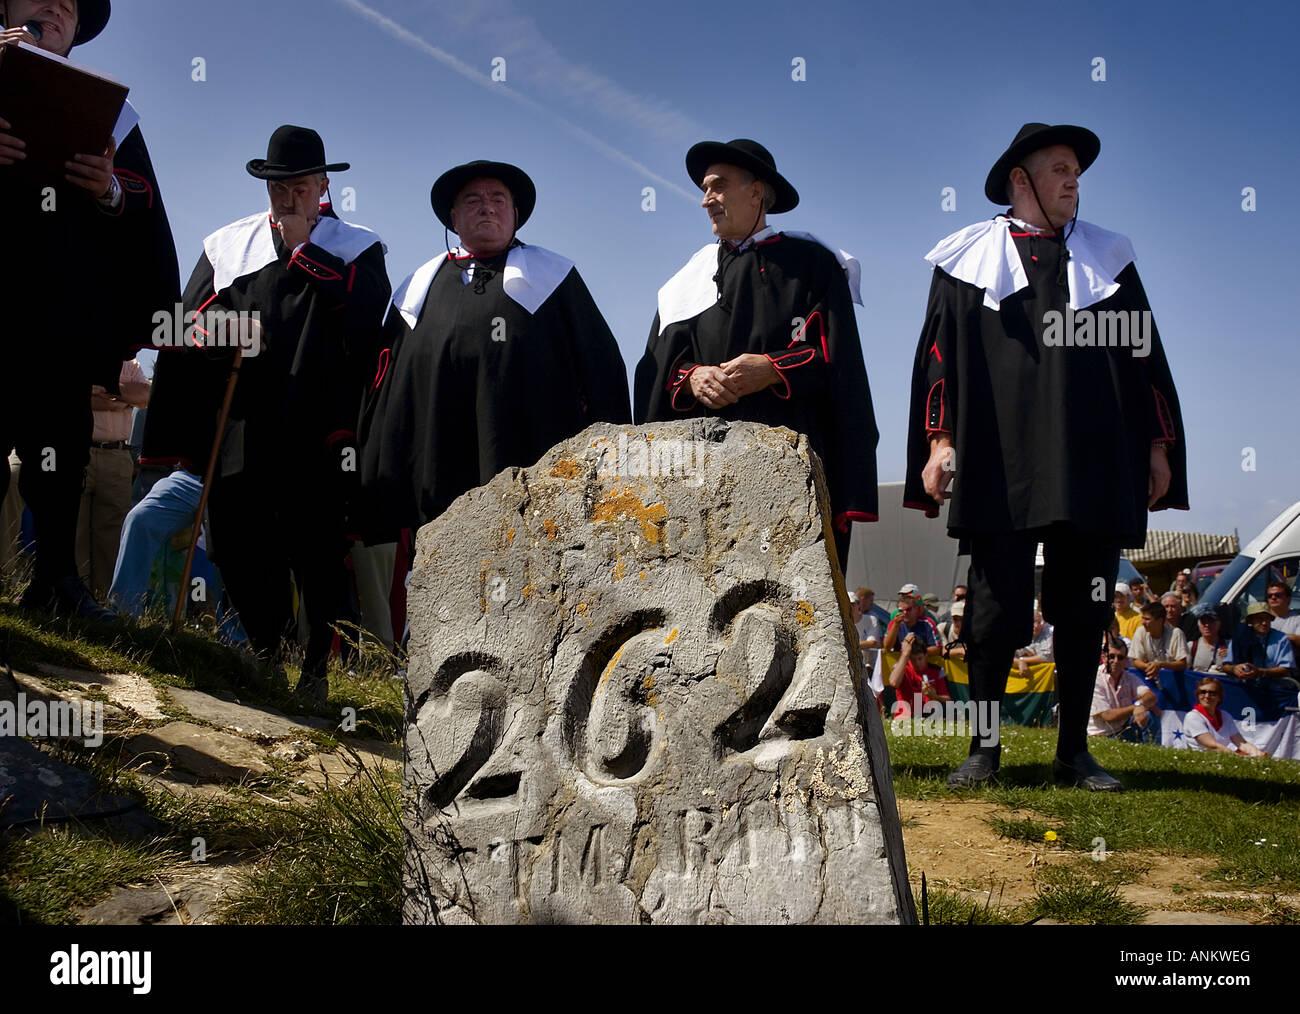 San Martin stone Tributo de las tres vacas festival Navarra Spain - Stock Image